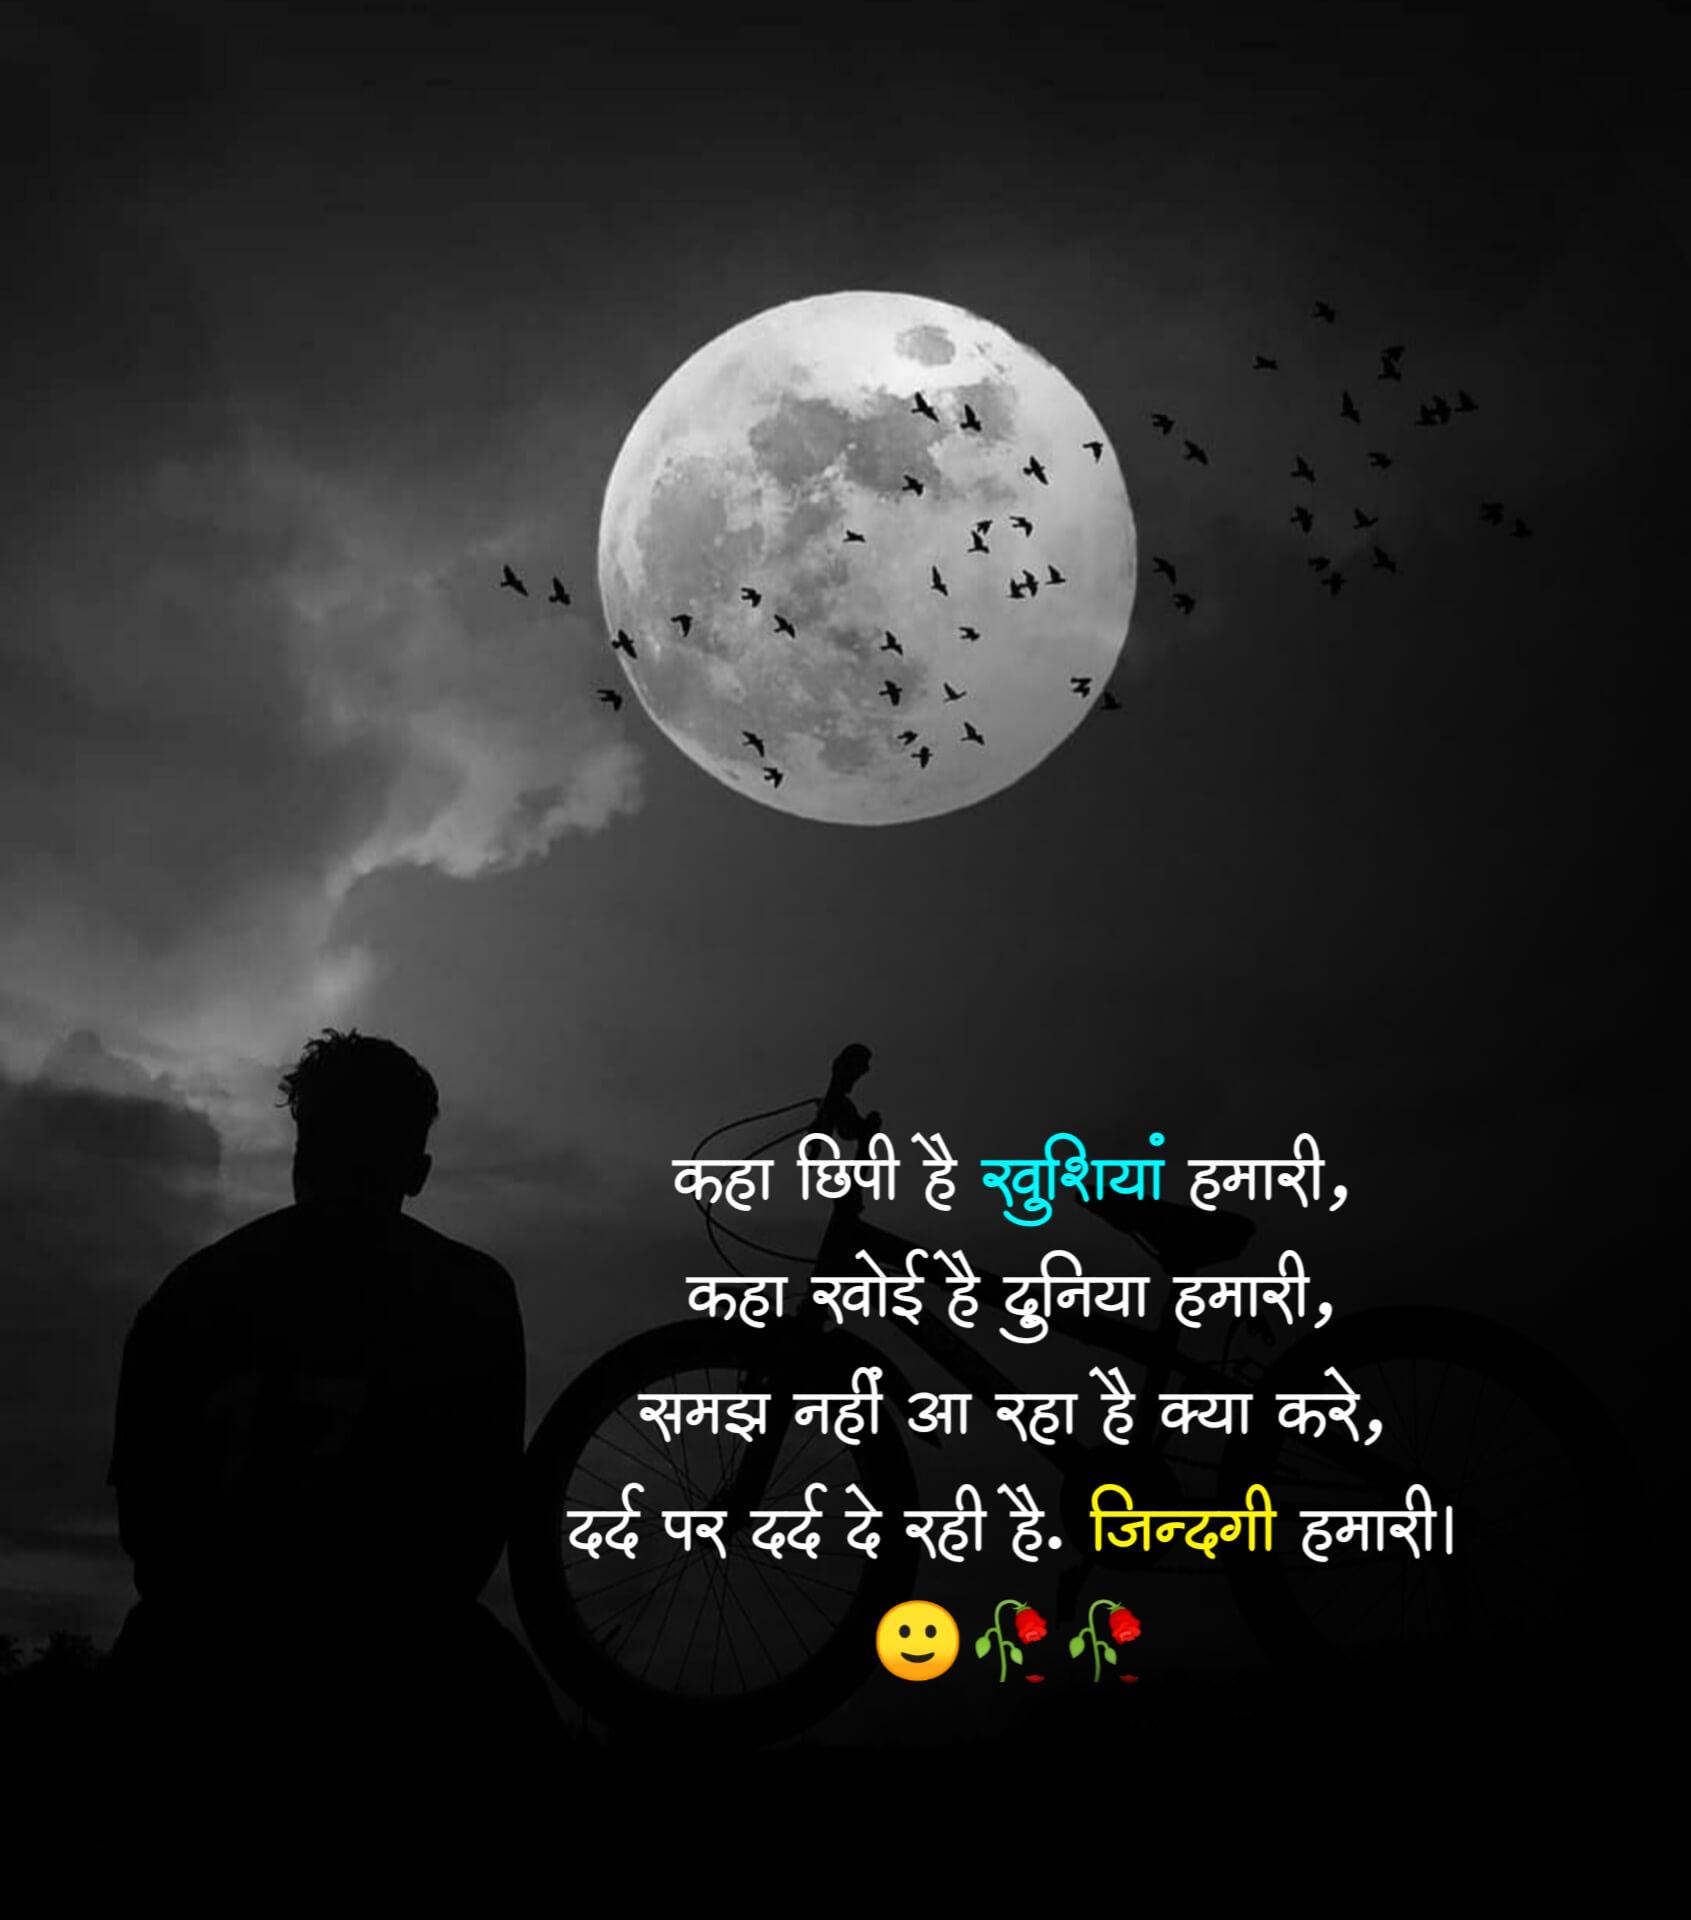 Latest Sad Boy Shayari Images for whatsapp